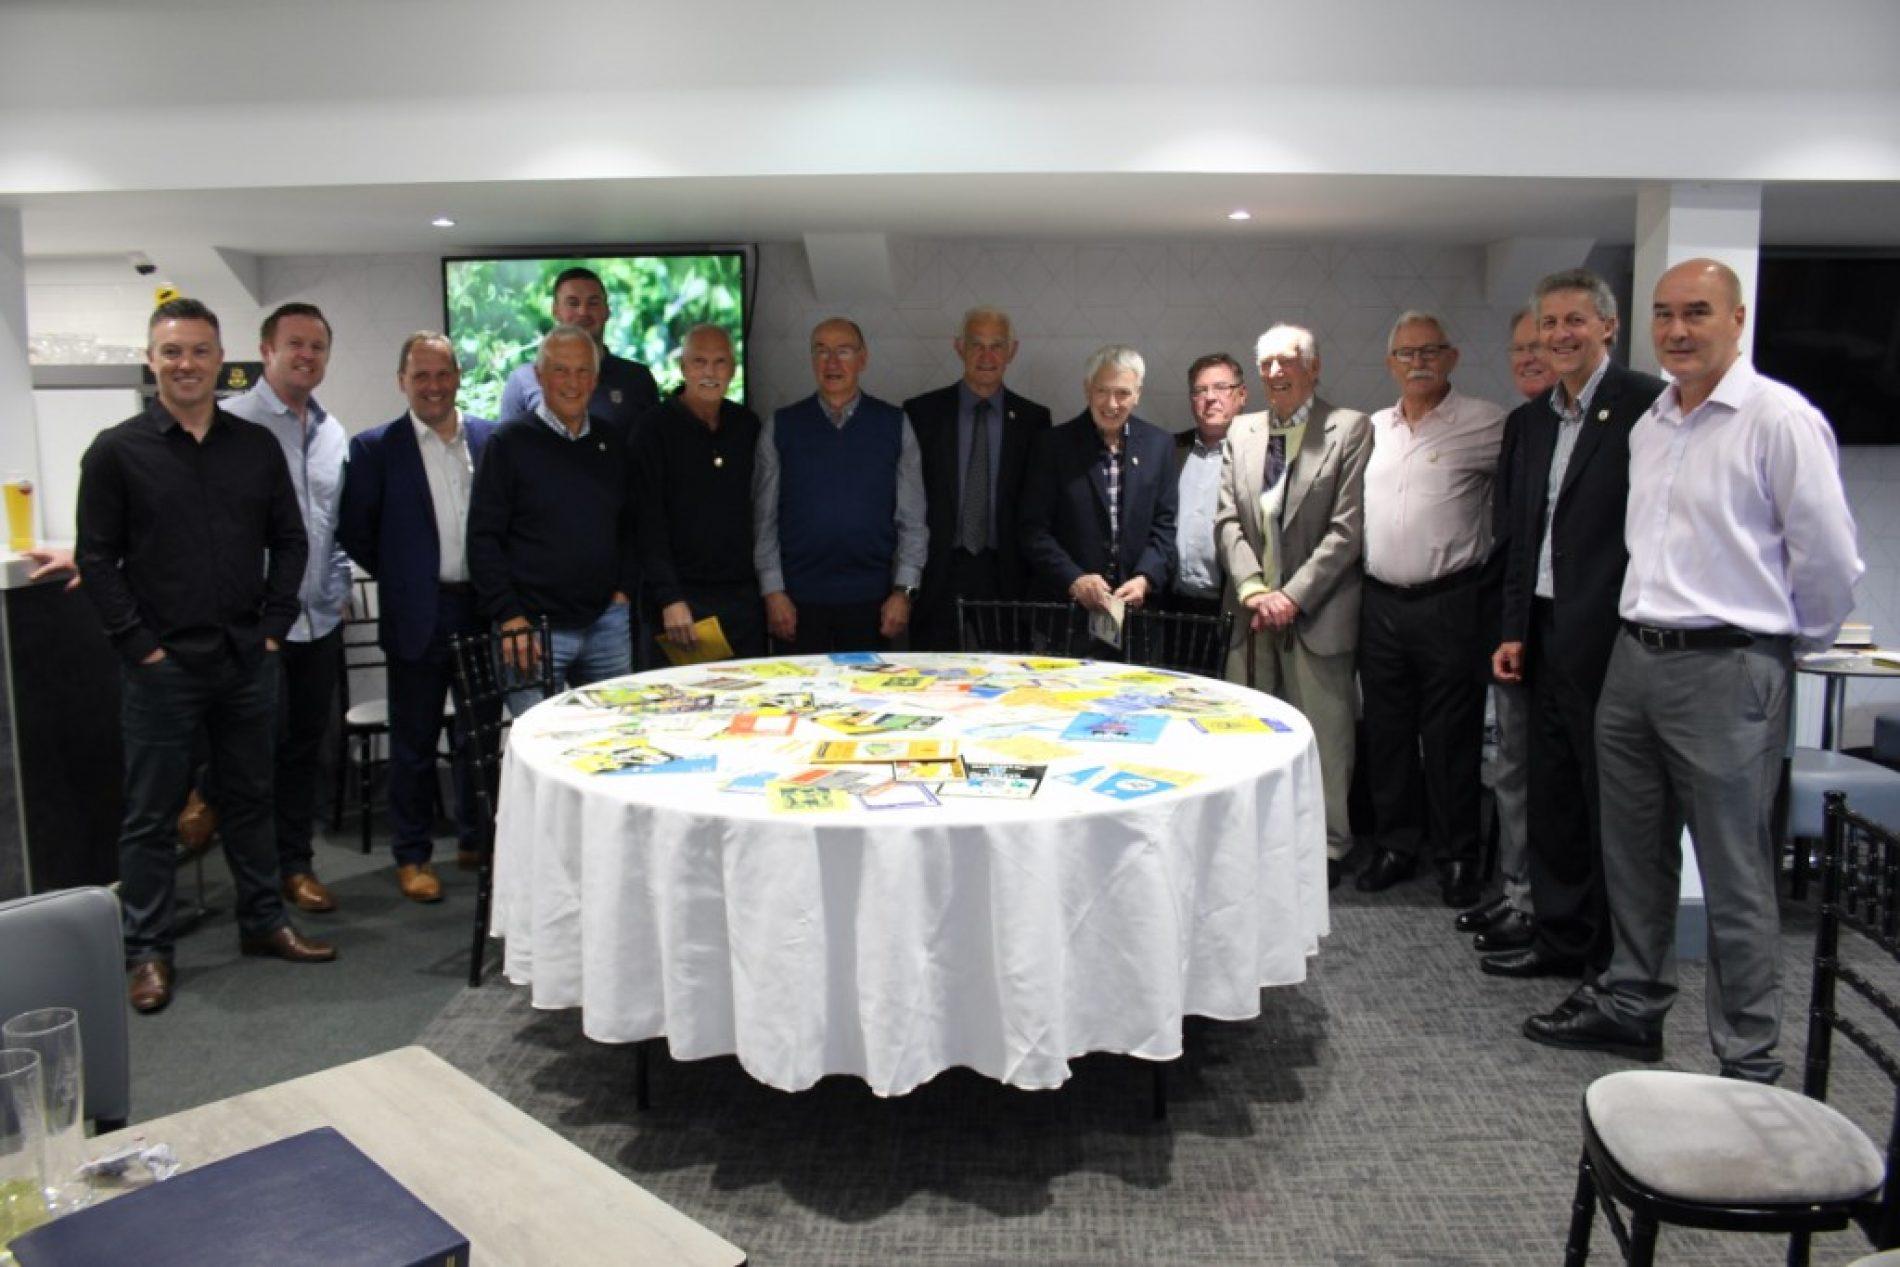 MEETING | Former Players Association